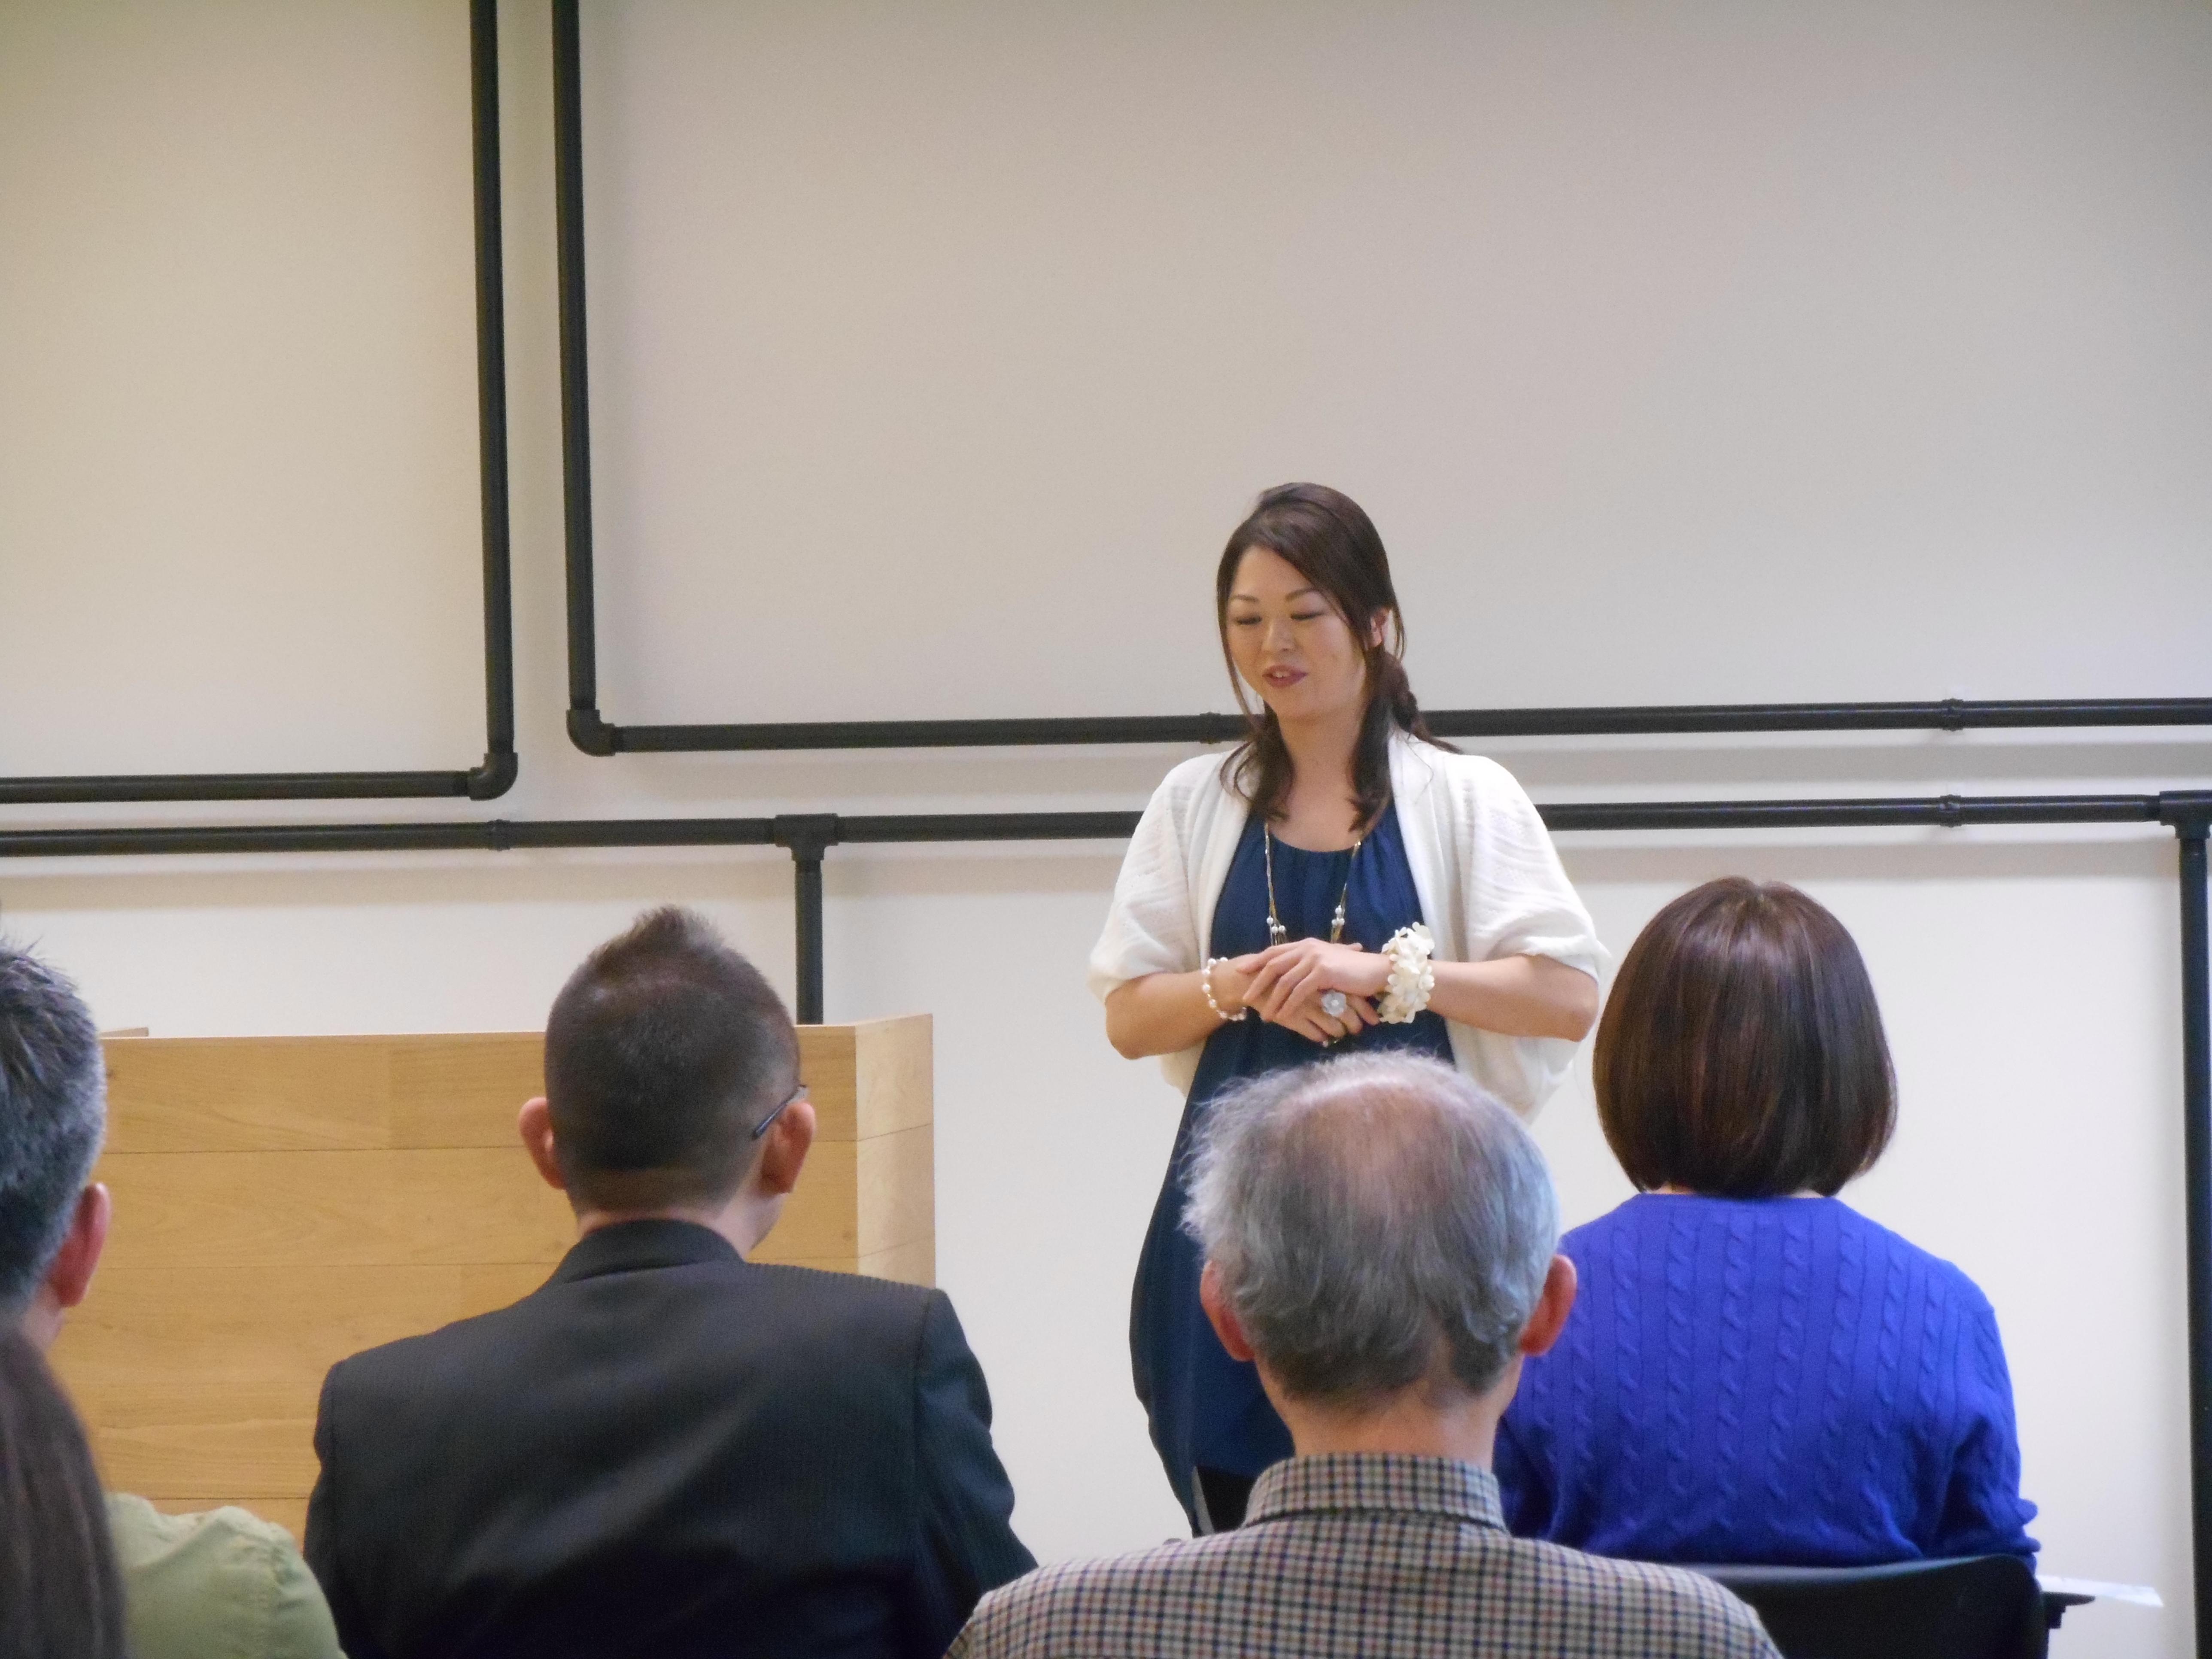 DSCN3715 - 2017年2月4日東京思風塾開催